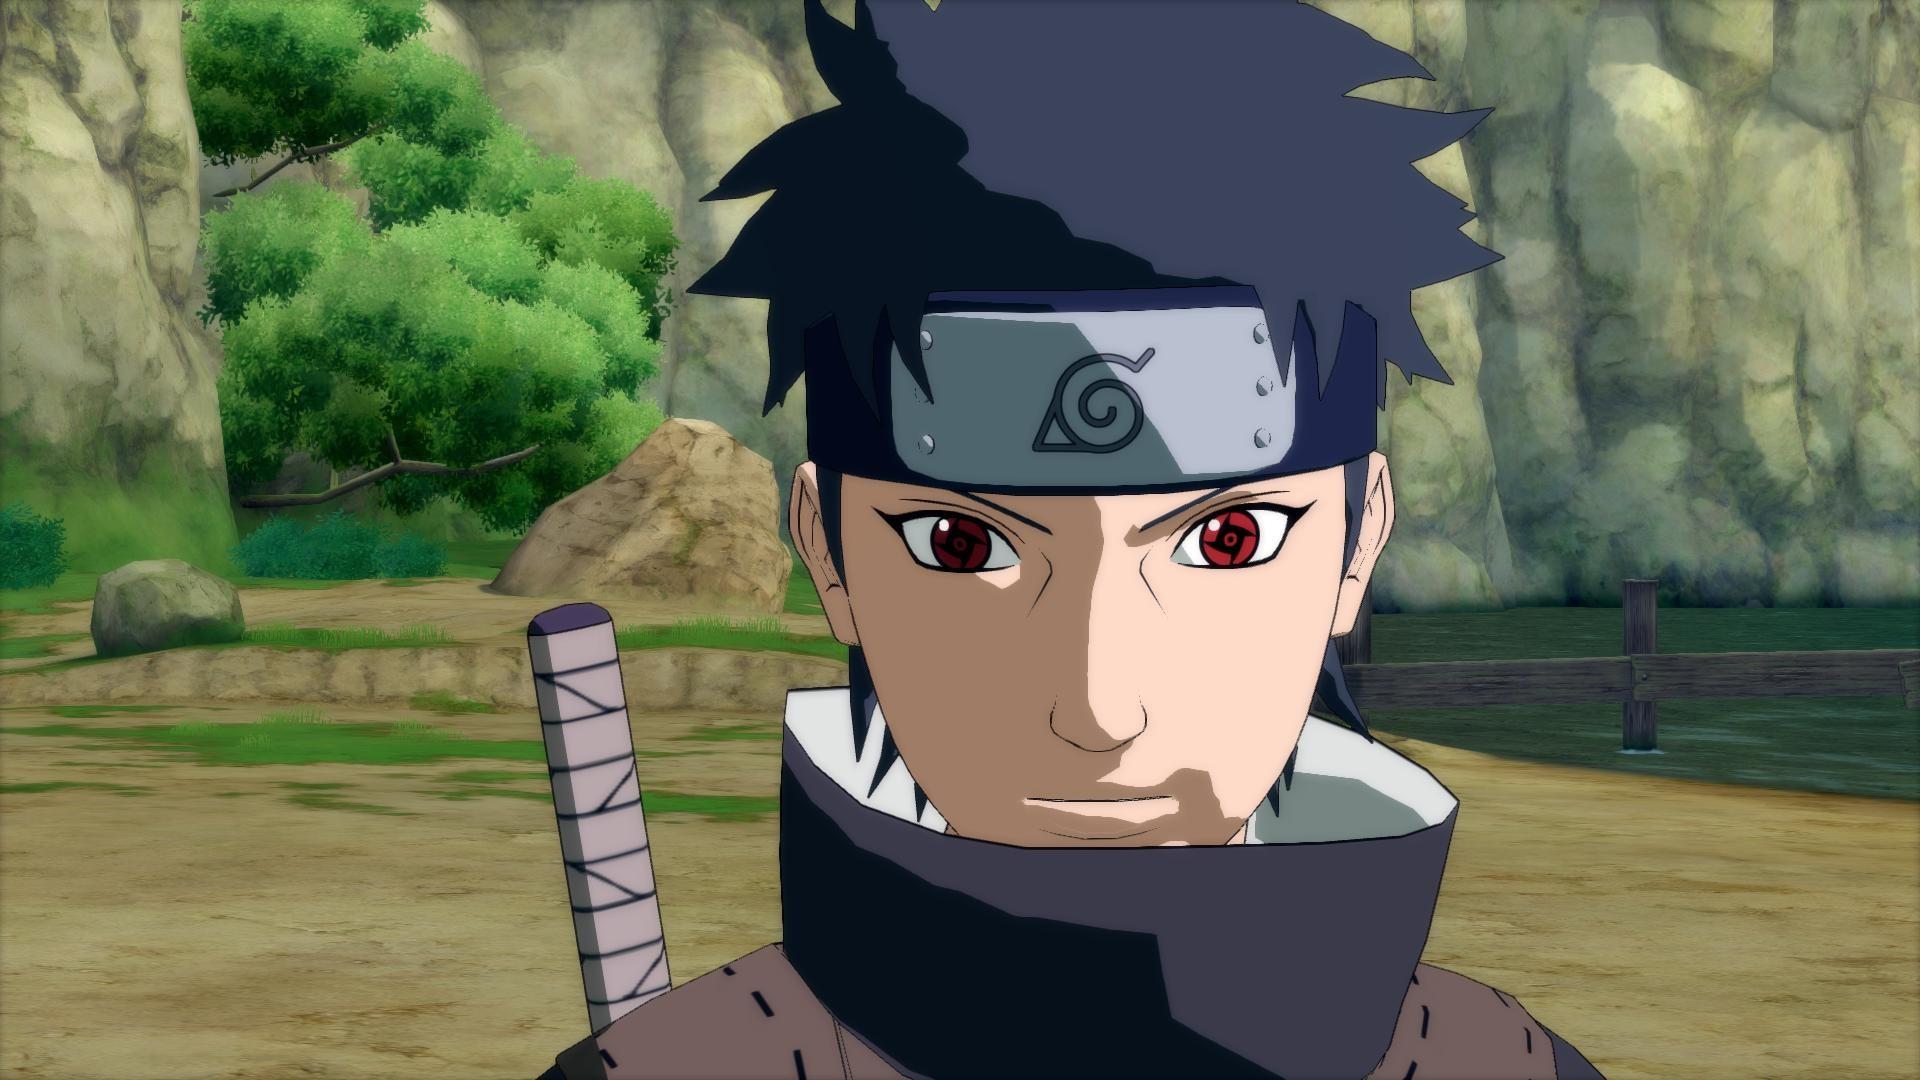 Video Game – Naruto Shippuden: Ultimate Ninja Storm 4 Shisui Uchiha  Wallpaper